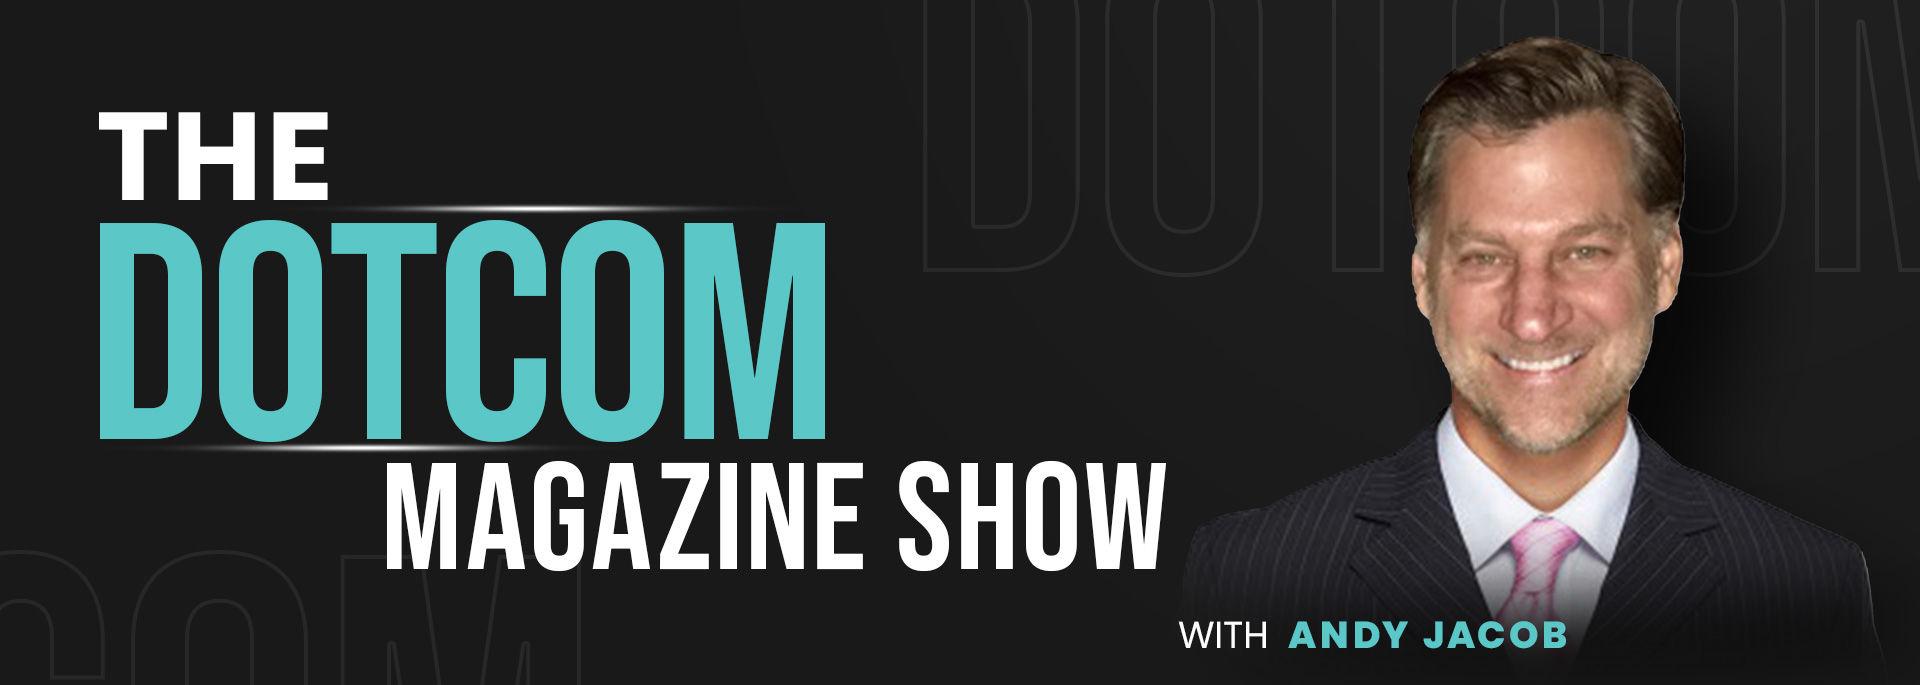 #The DotCom Magazine Show channel